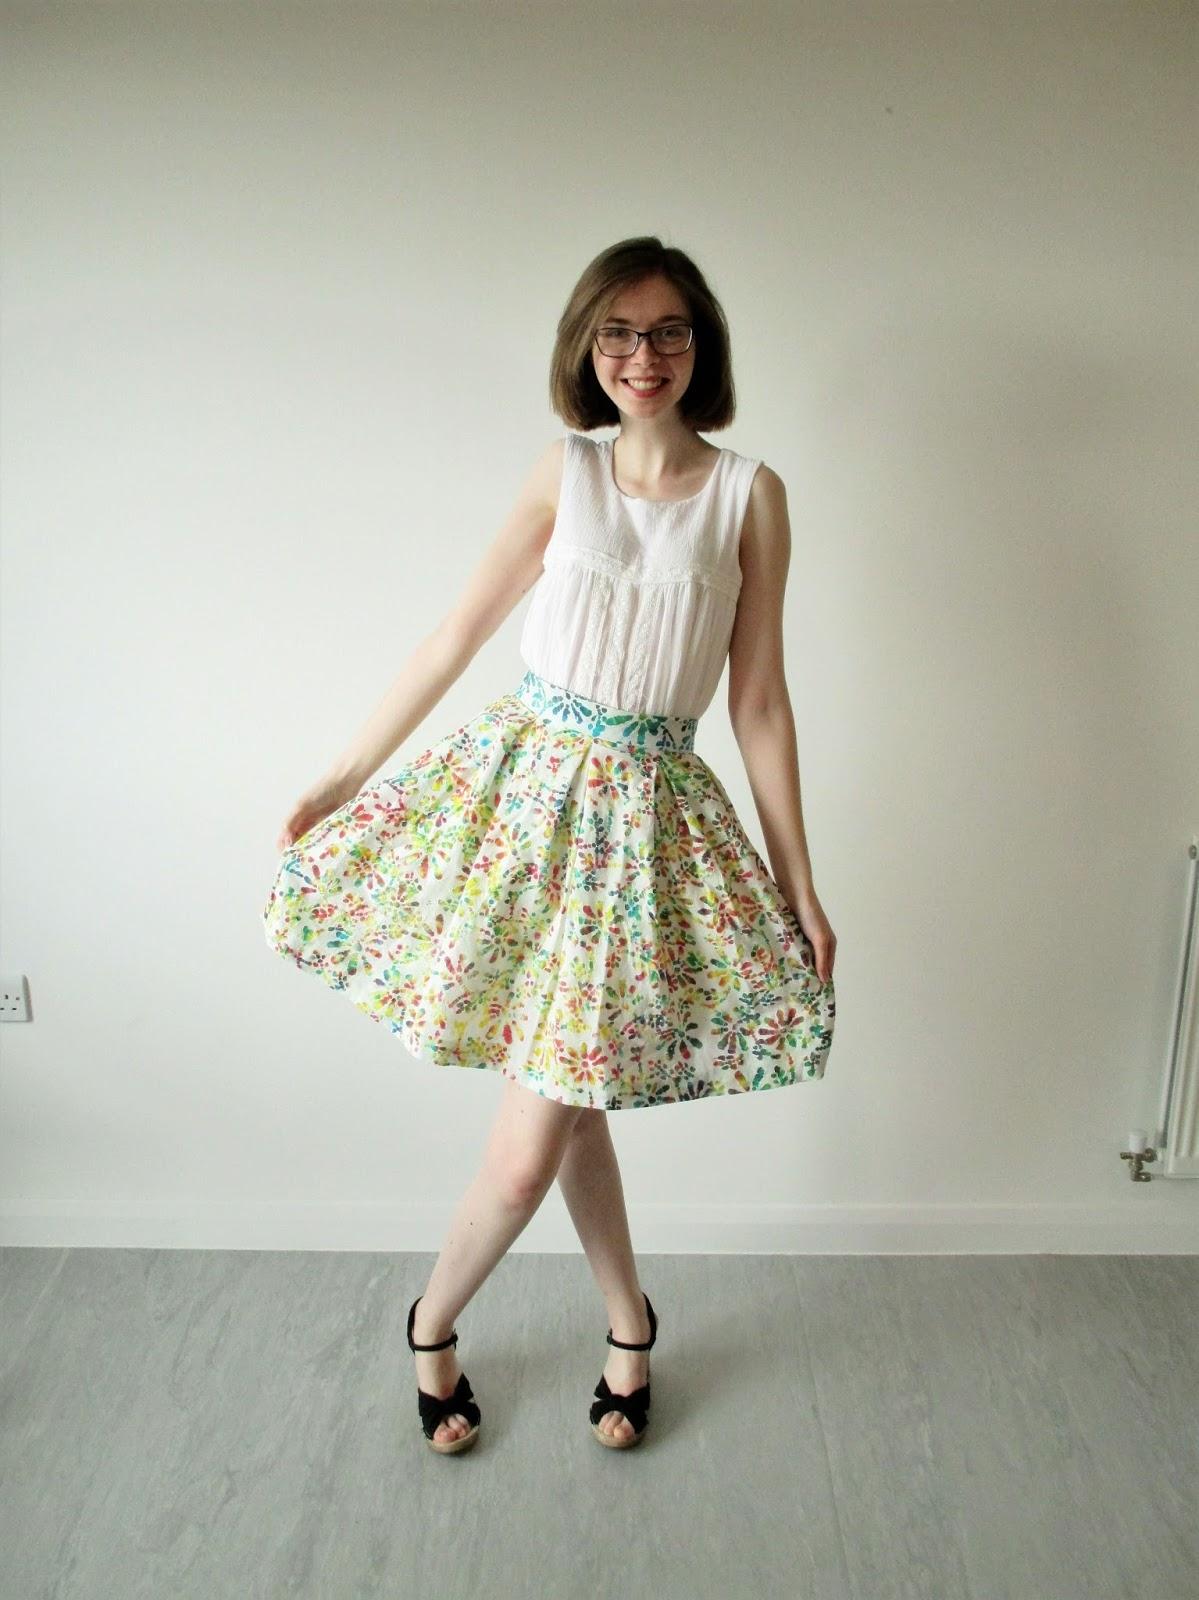 Blog blouse down find upskirt